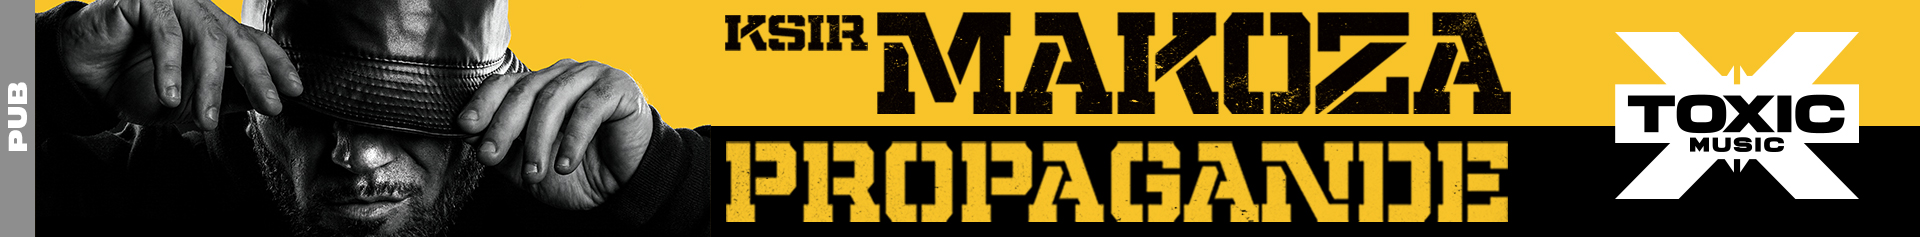 Ksir Makoza - Propagande